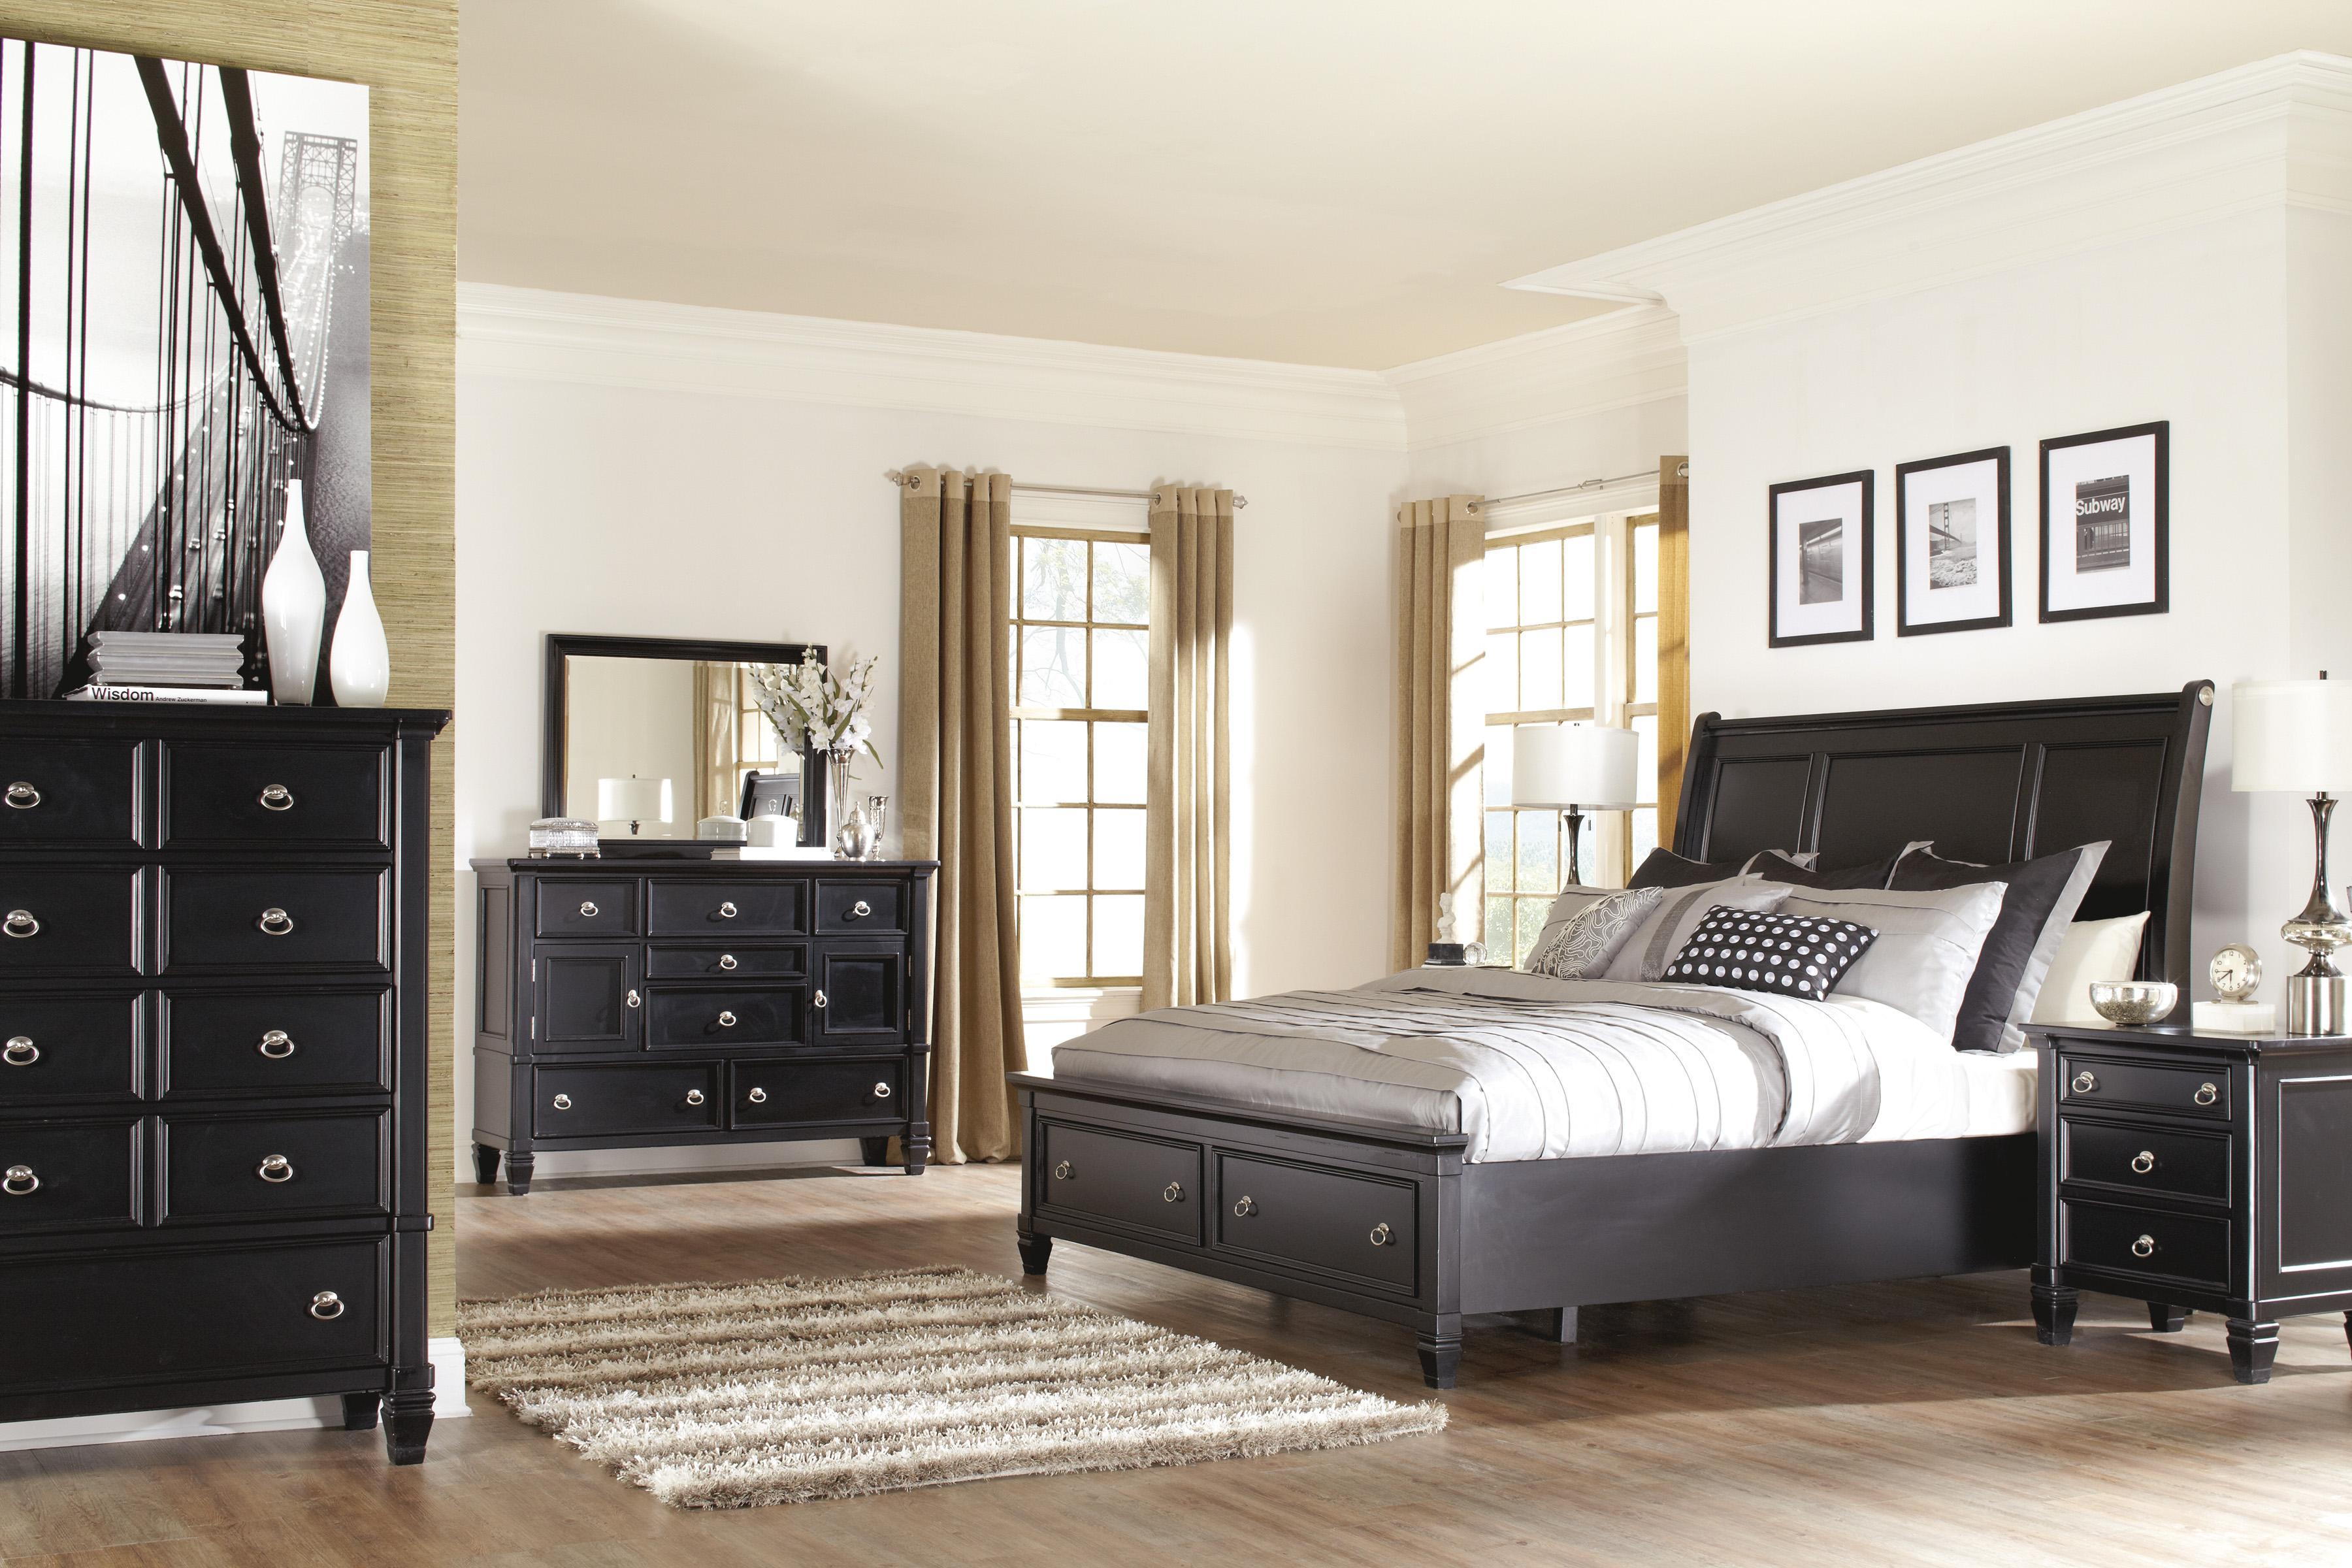 Millennium Greensburg King Bedroom Group - Item Number: B671 K Bedroom Group 1